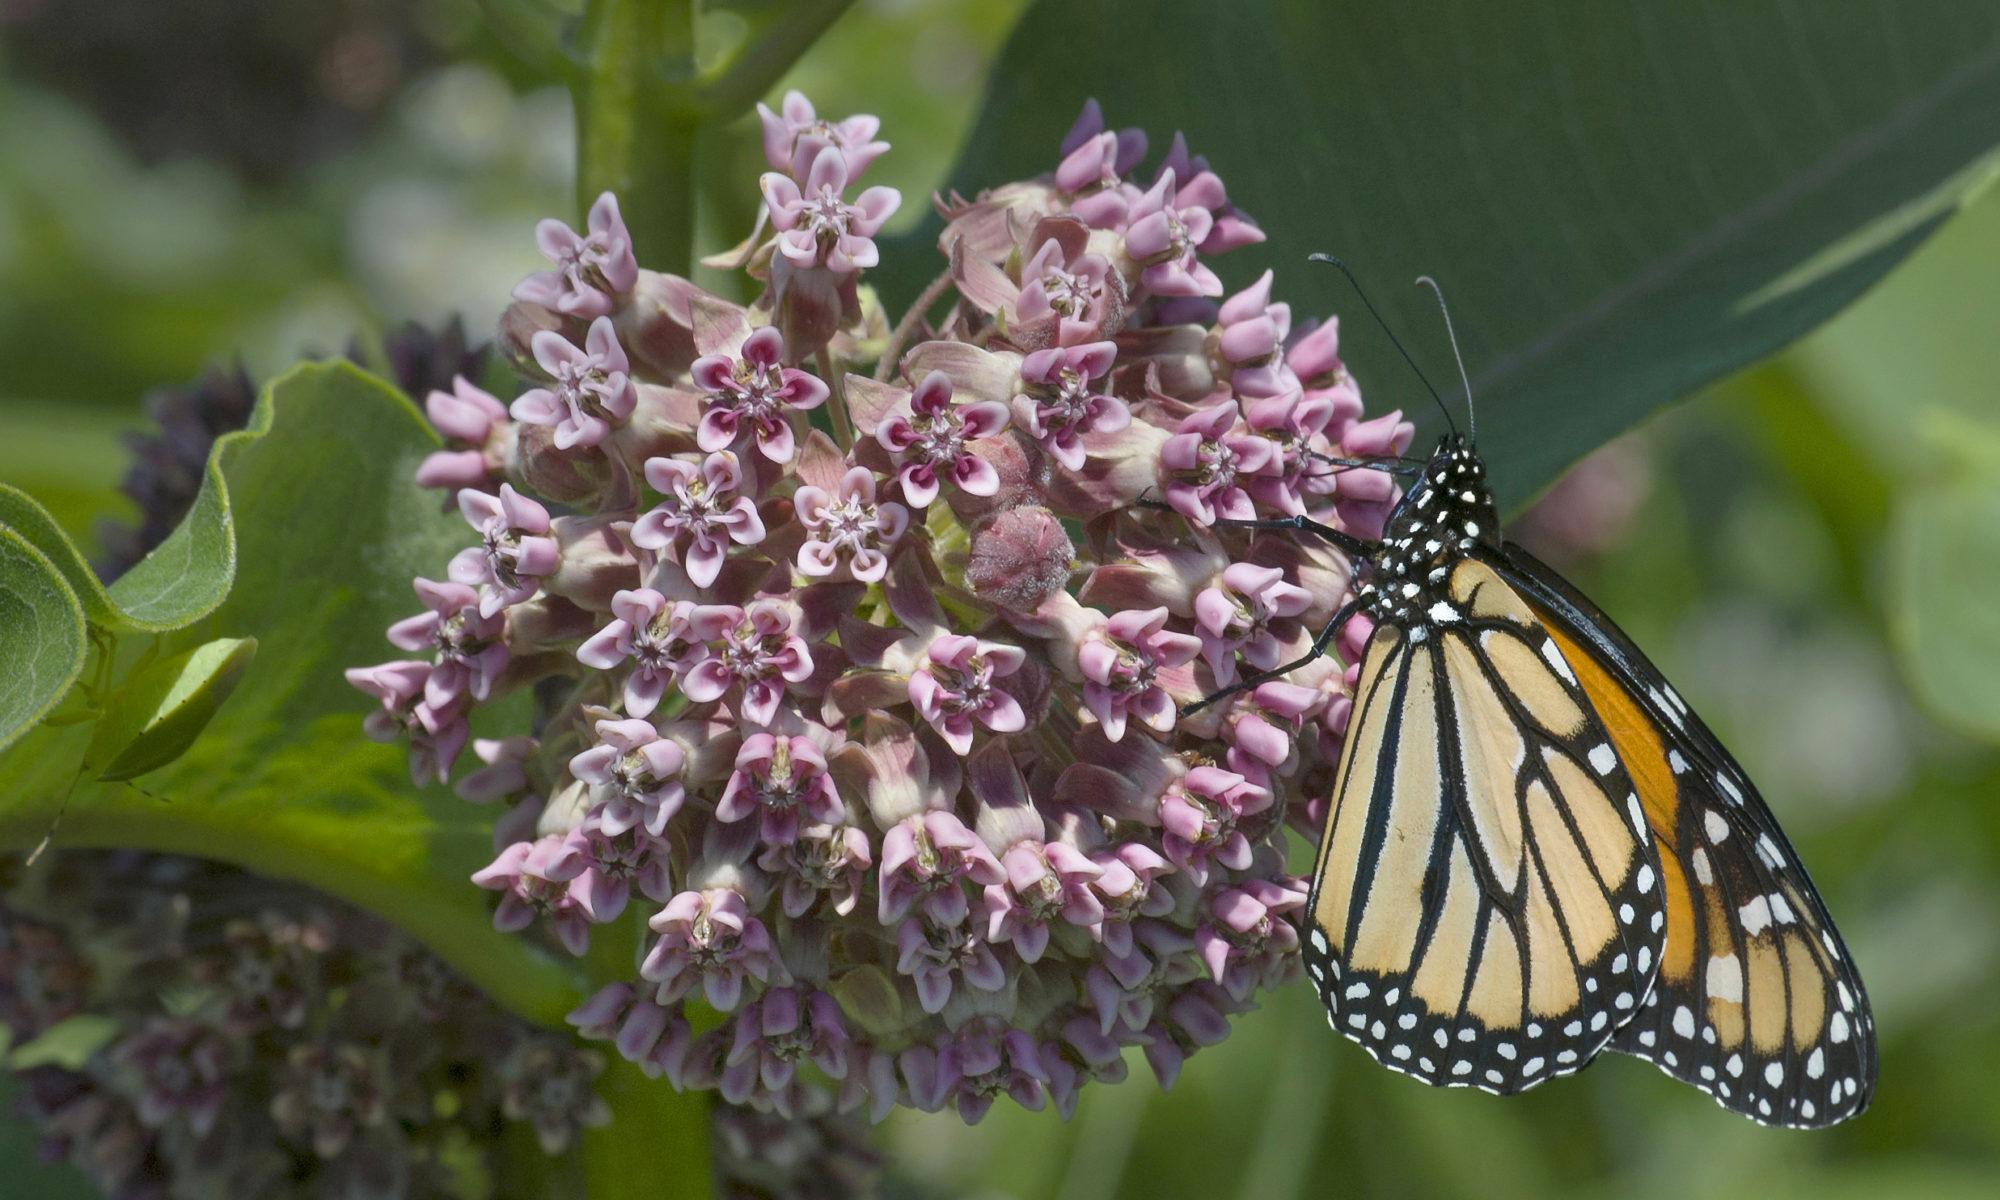 Chattanooga Area Pollinator Partnership